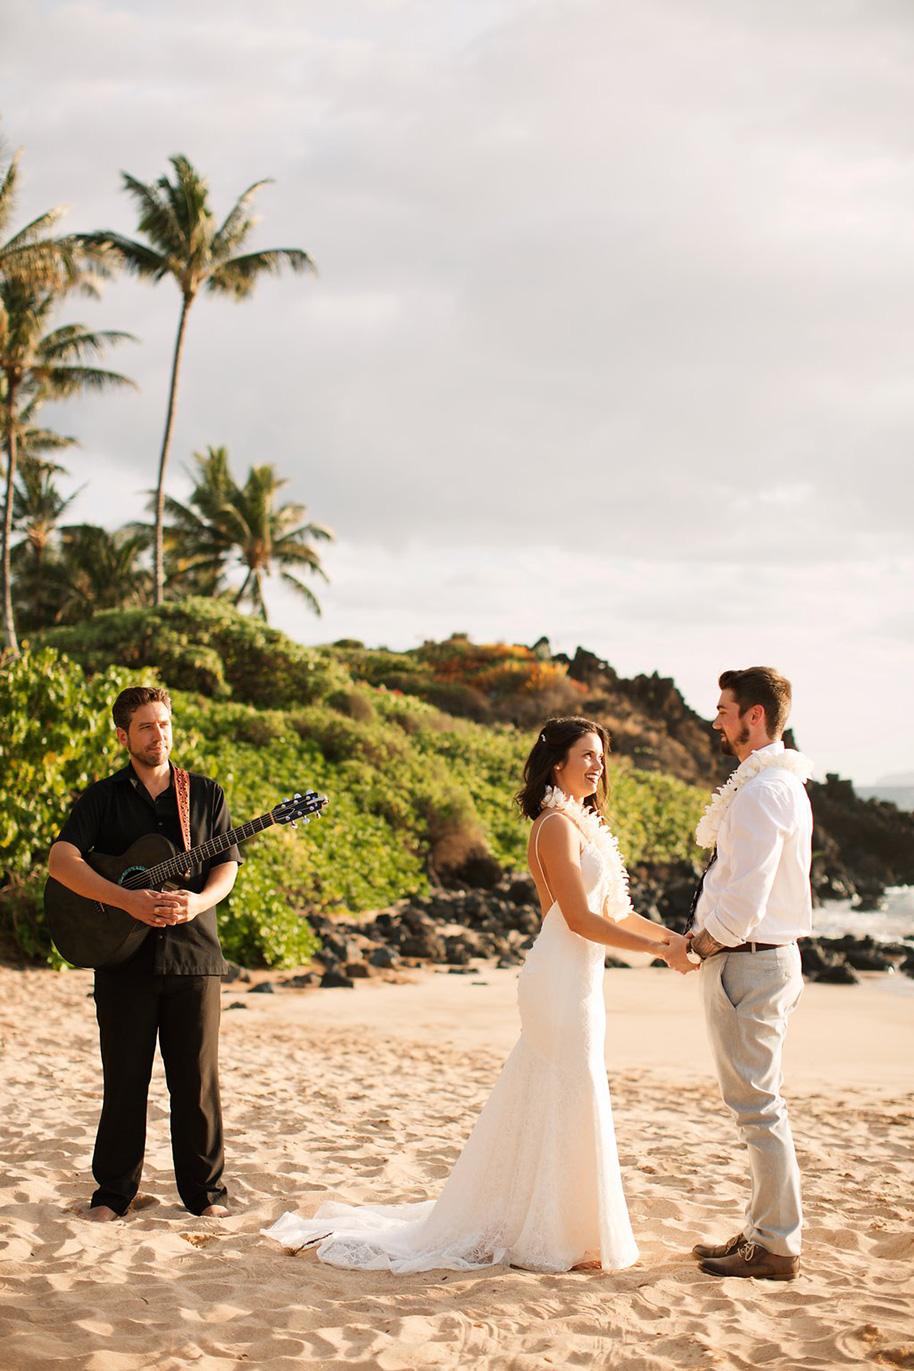 Maui-Beach-Wedding-070616-9